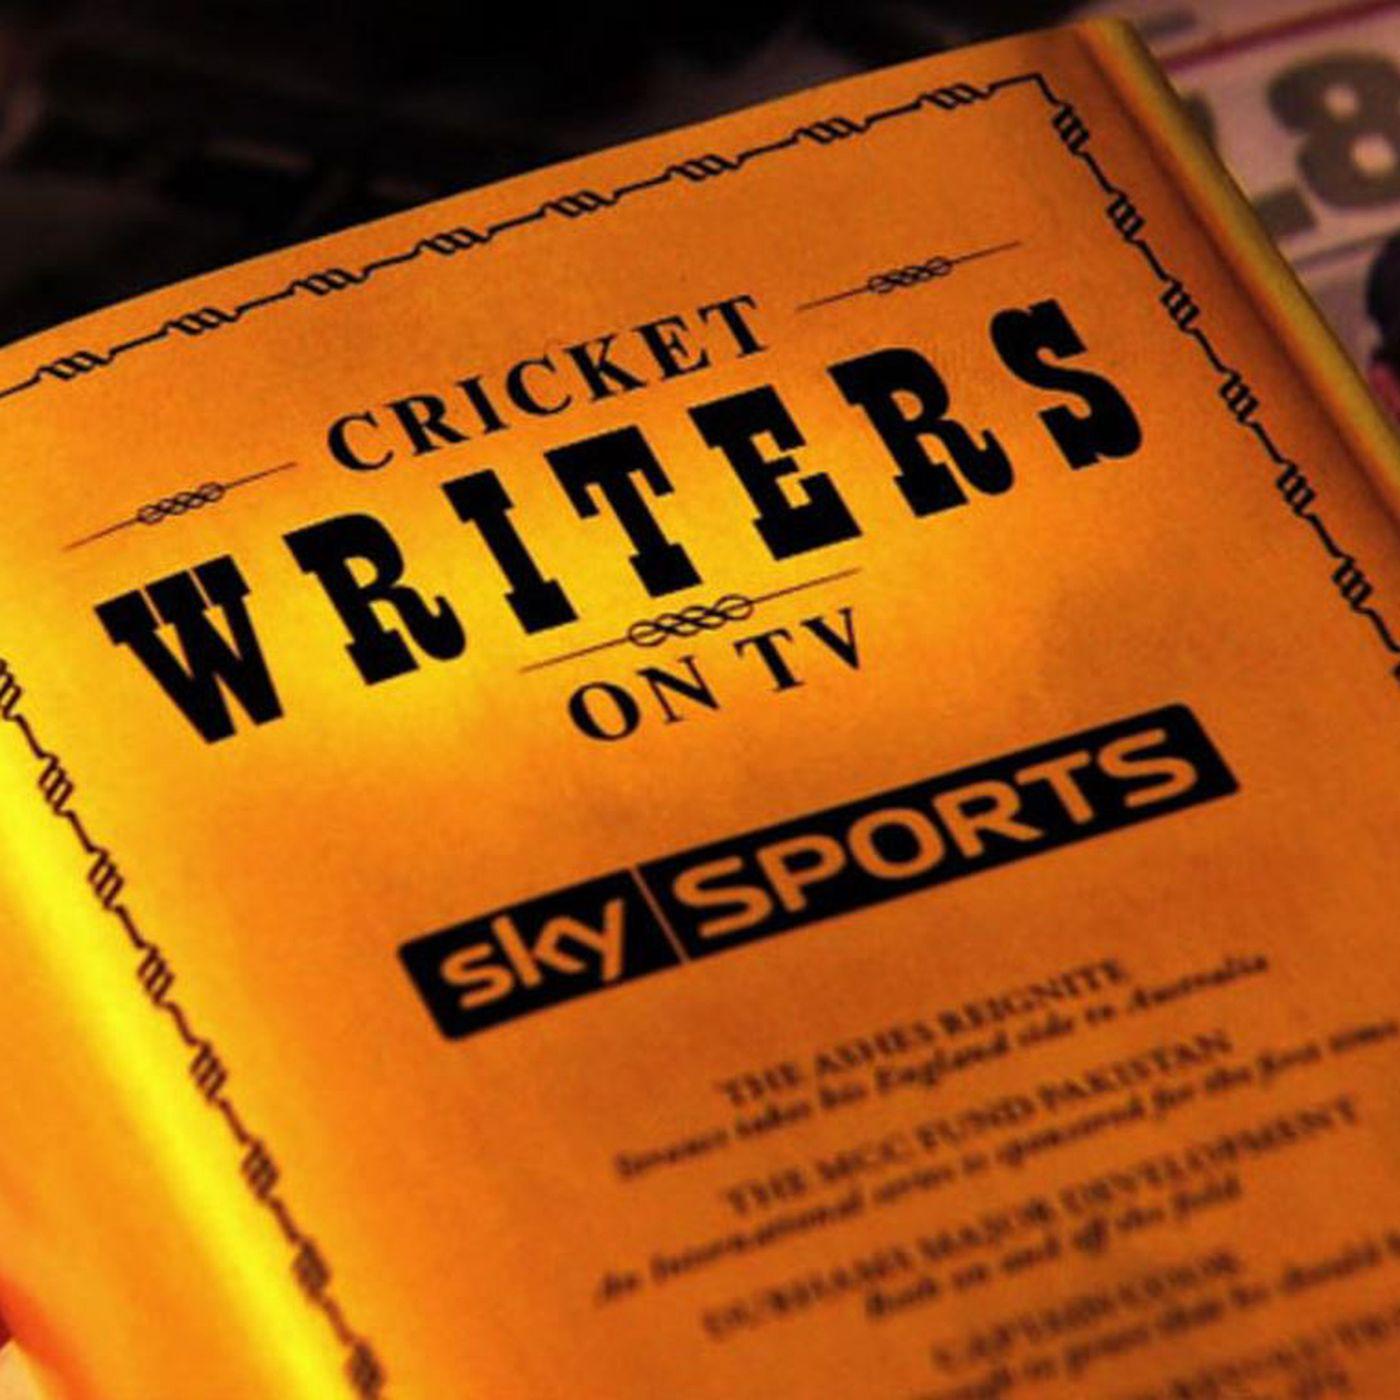 Cricket Writers on TV - June 18